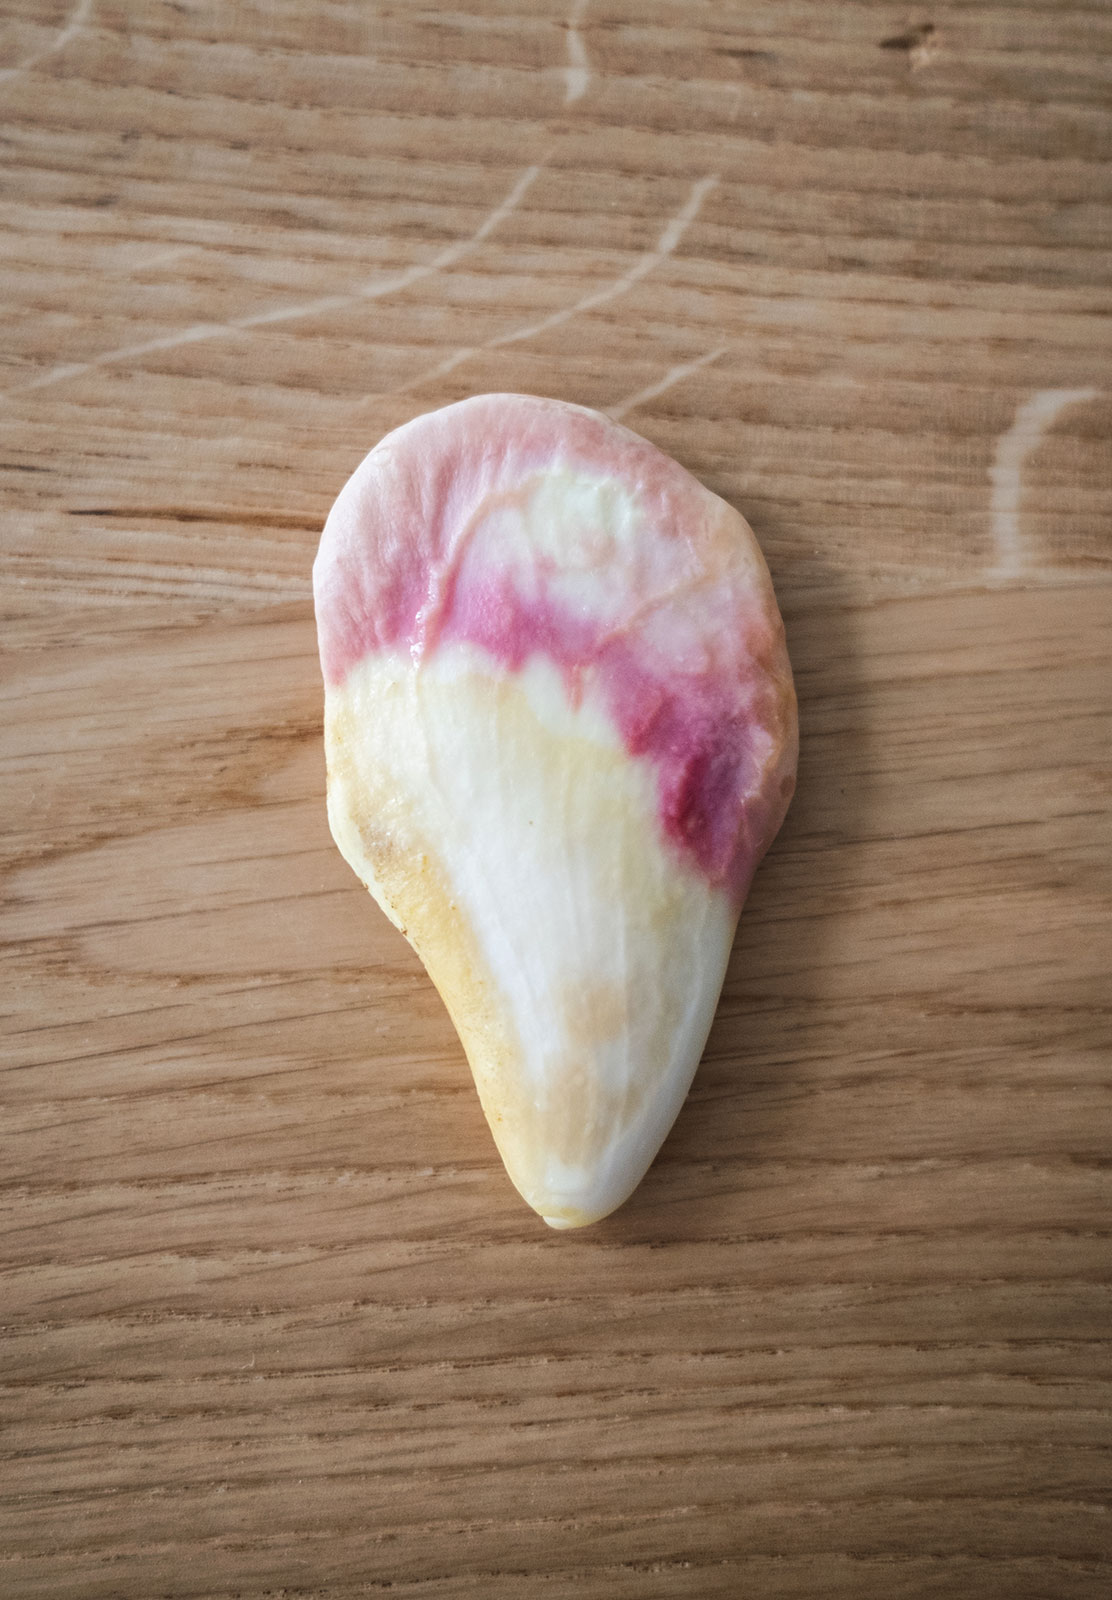 Pink mango seed